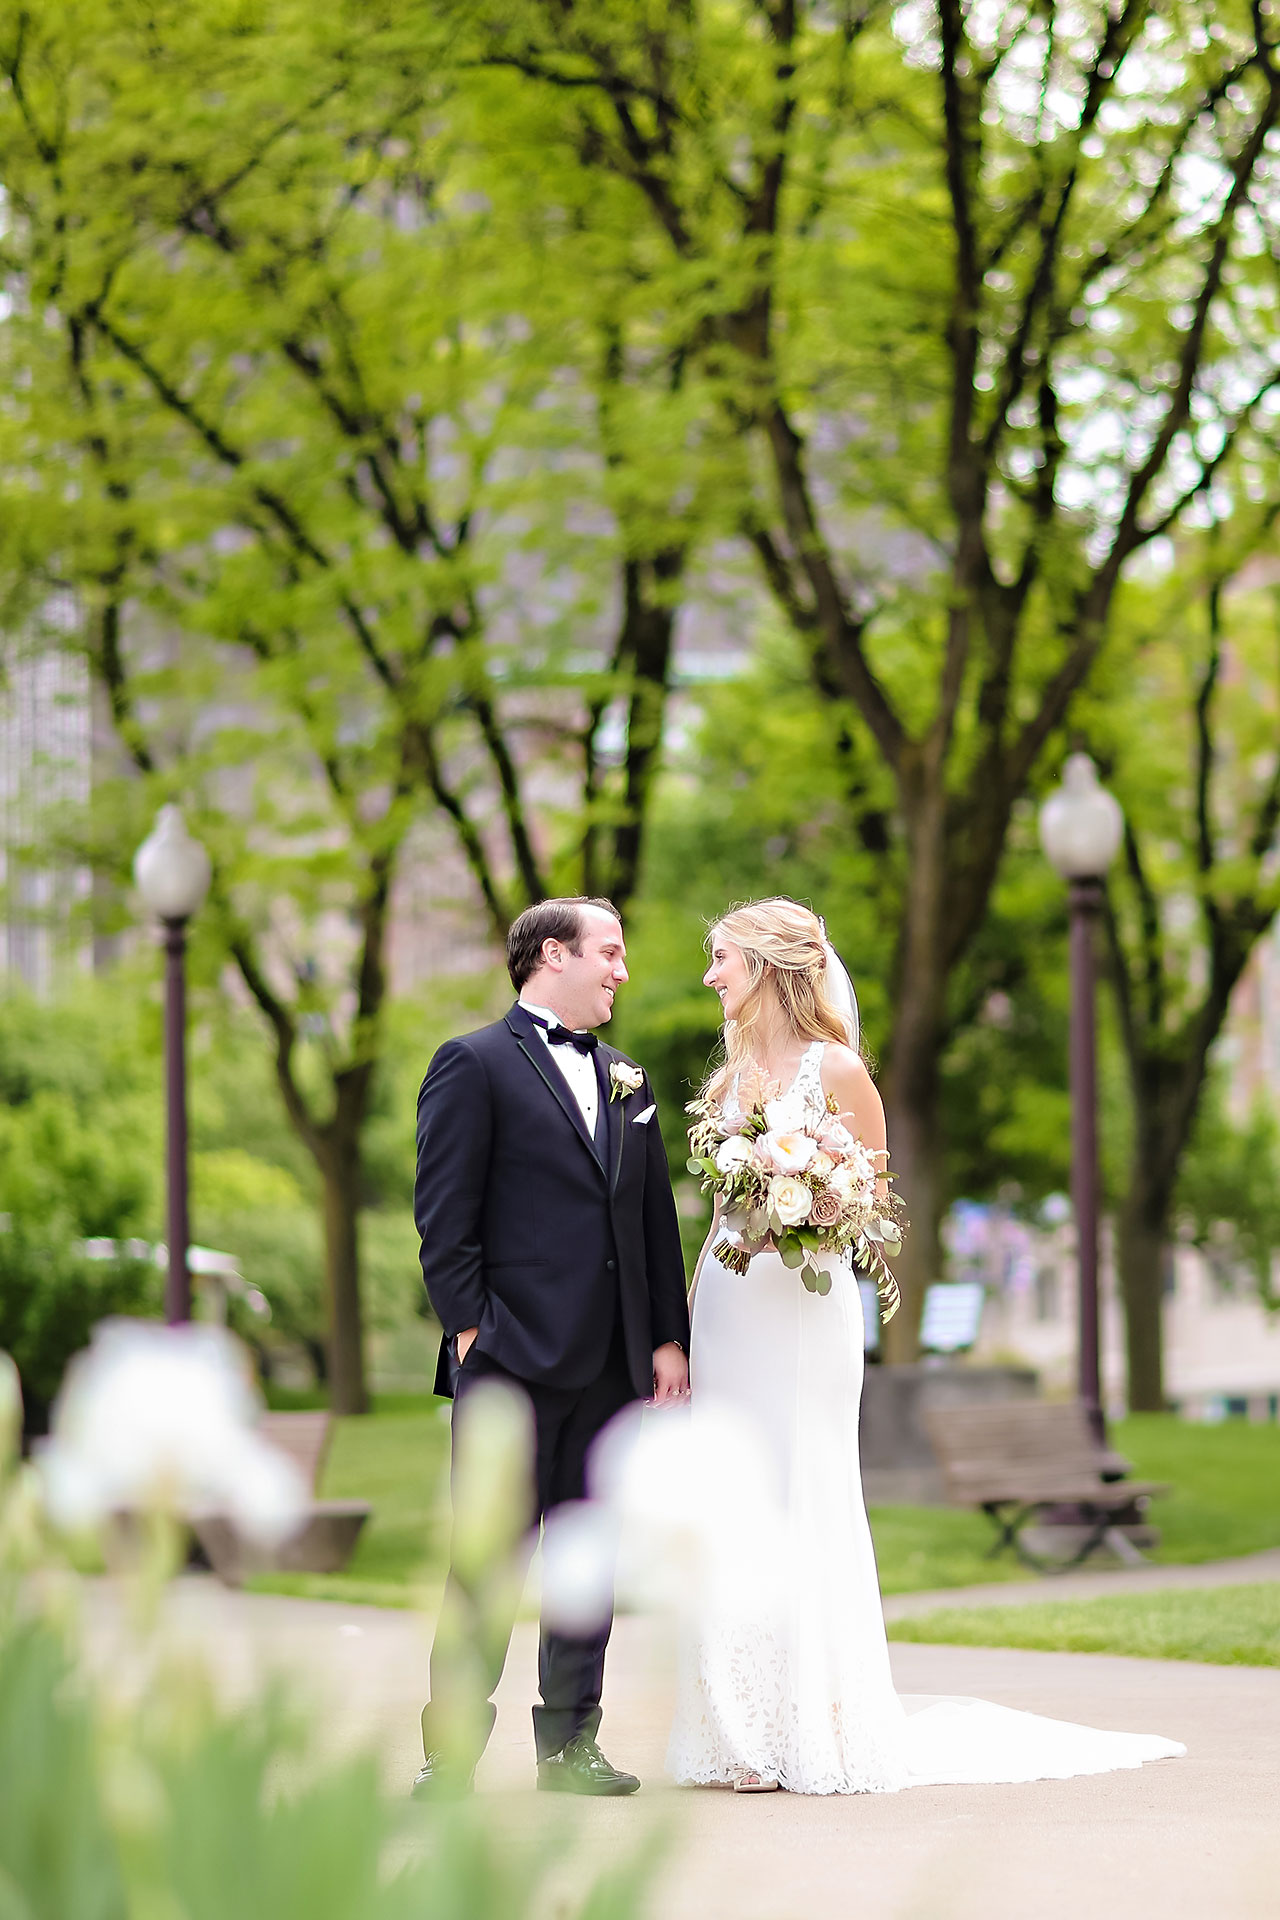 Allison Jeff Union Station Crowne Plaza Indianapolis wedding 187